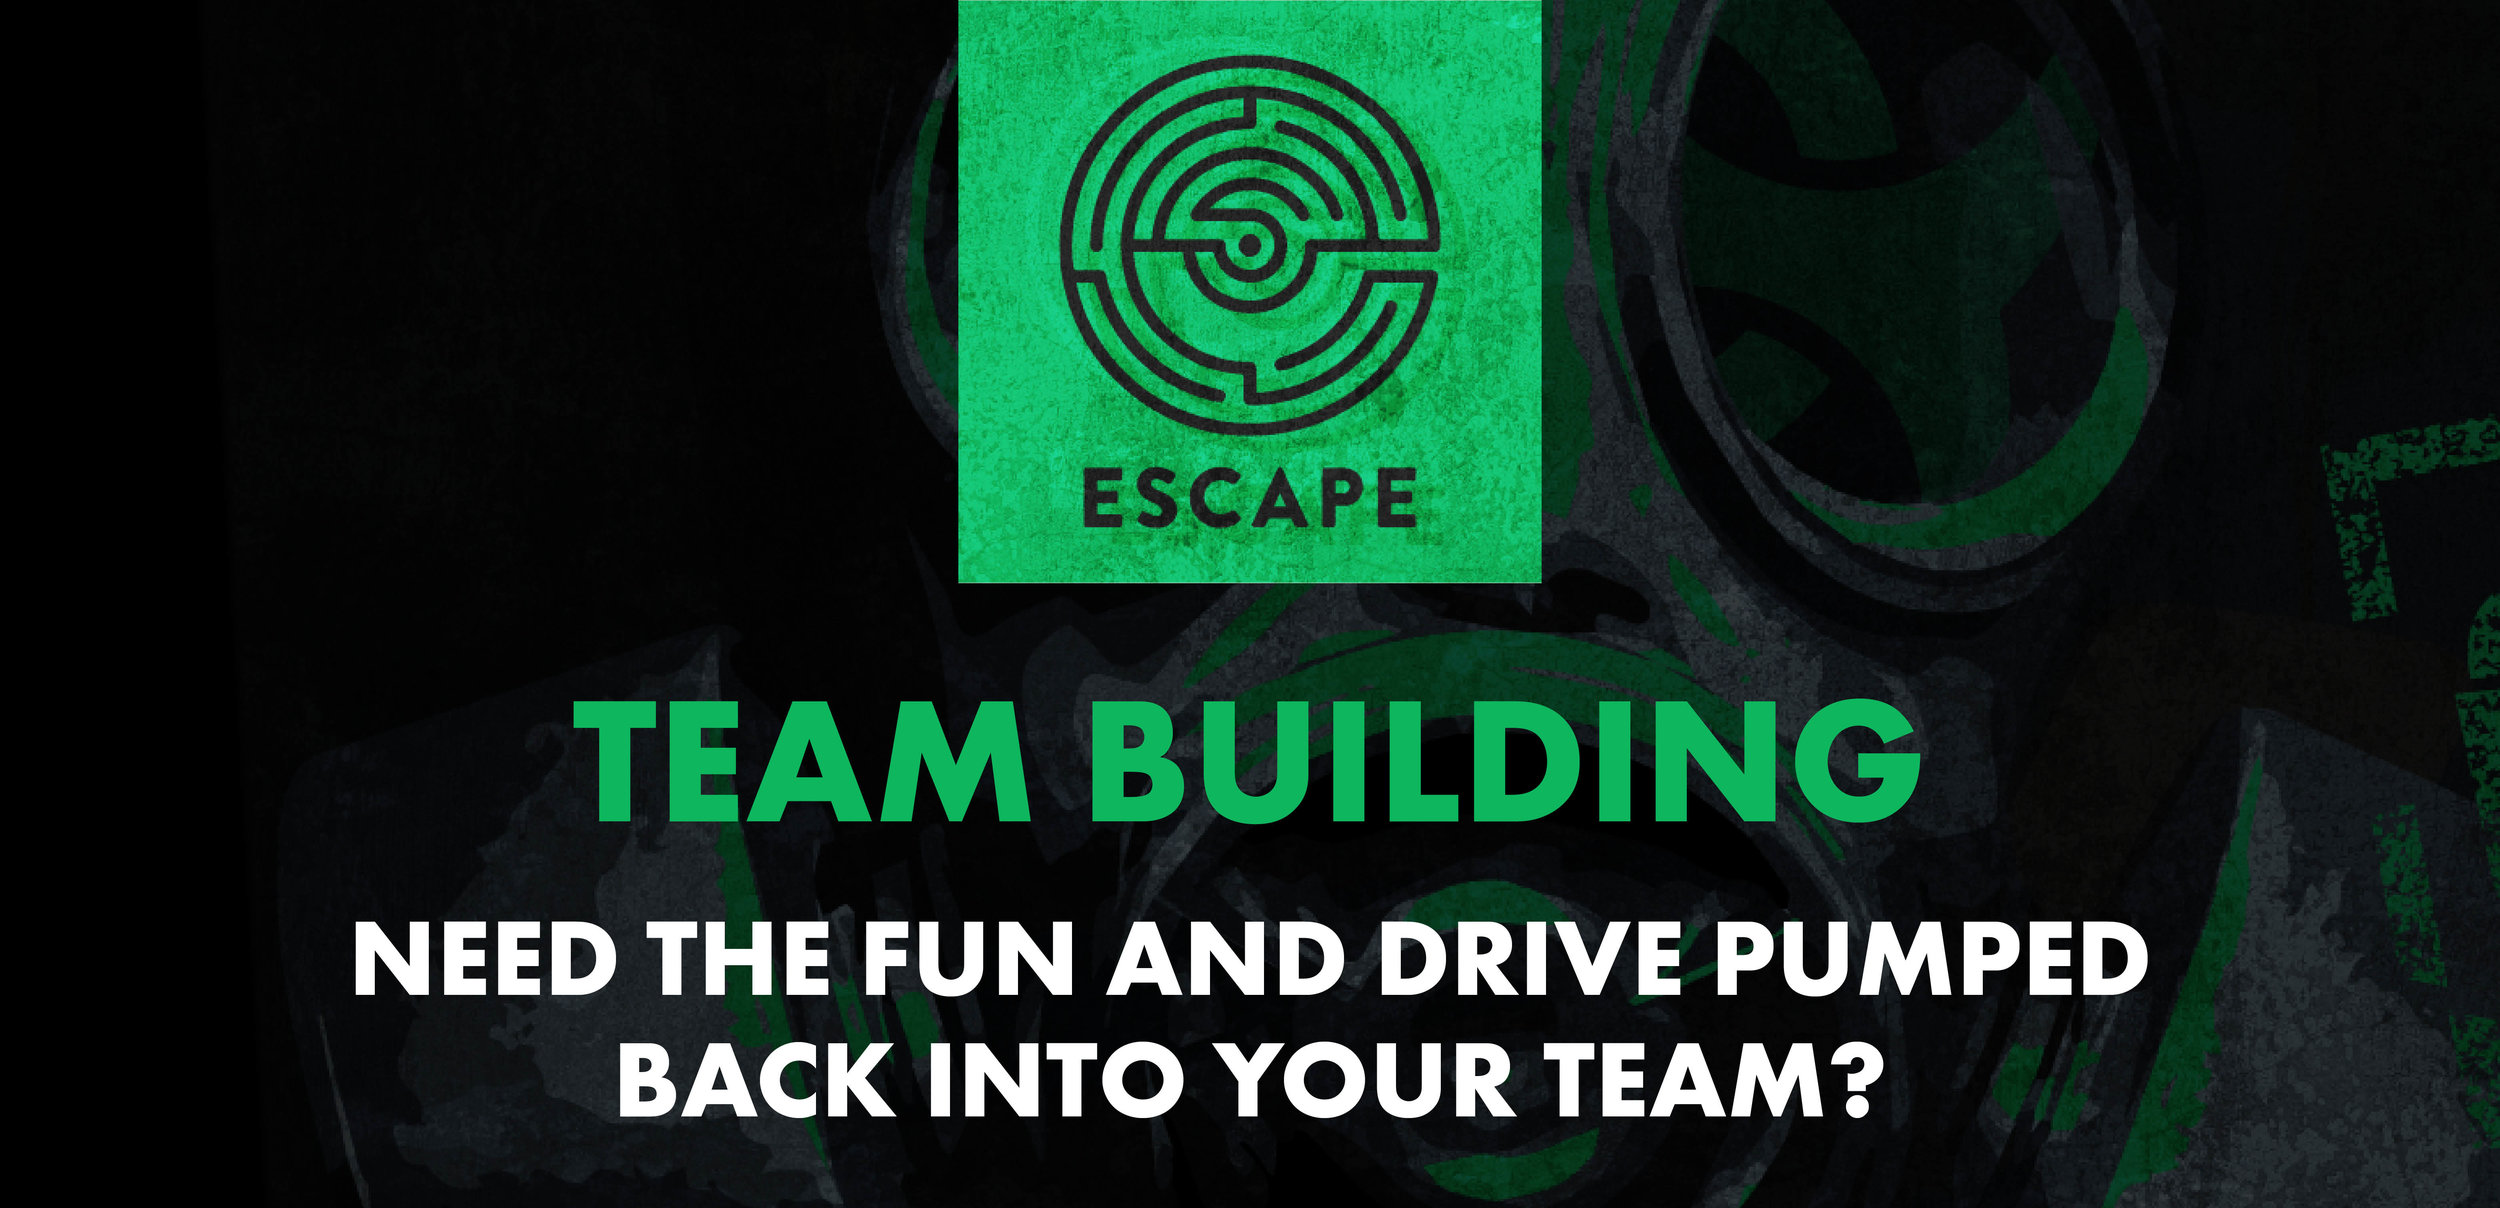 Escape Advert 2.jpg